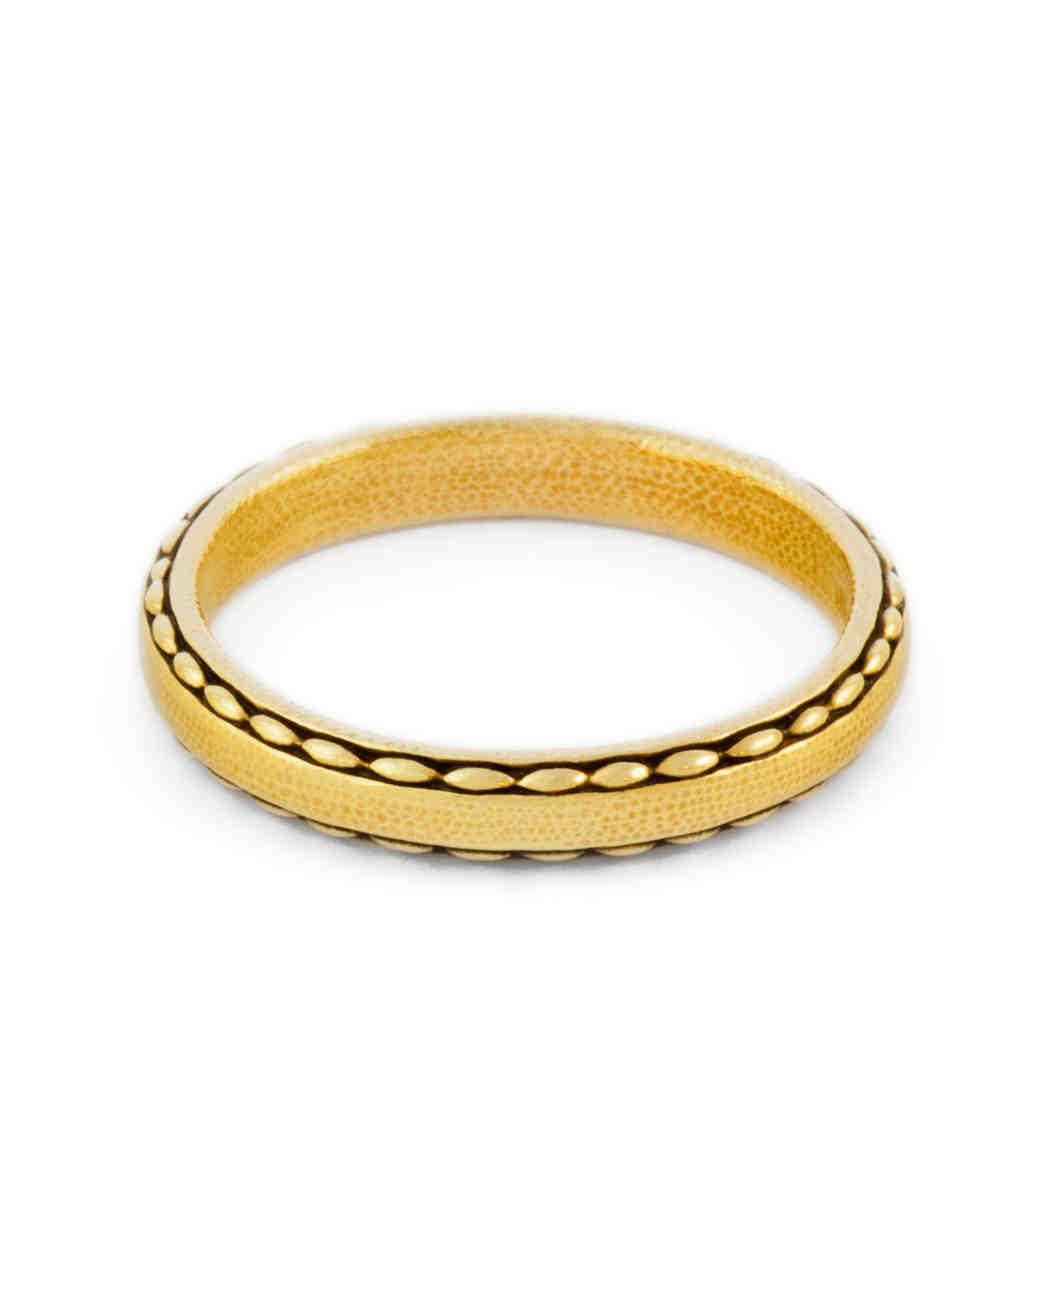 gold-wedding-bands-alex-sepkus-gold-band-replacement-0415.jpg